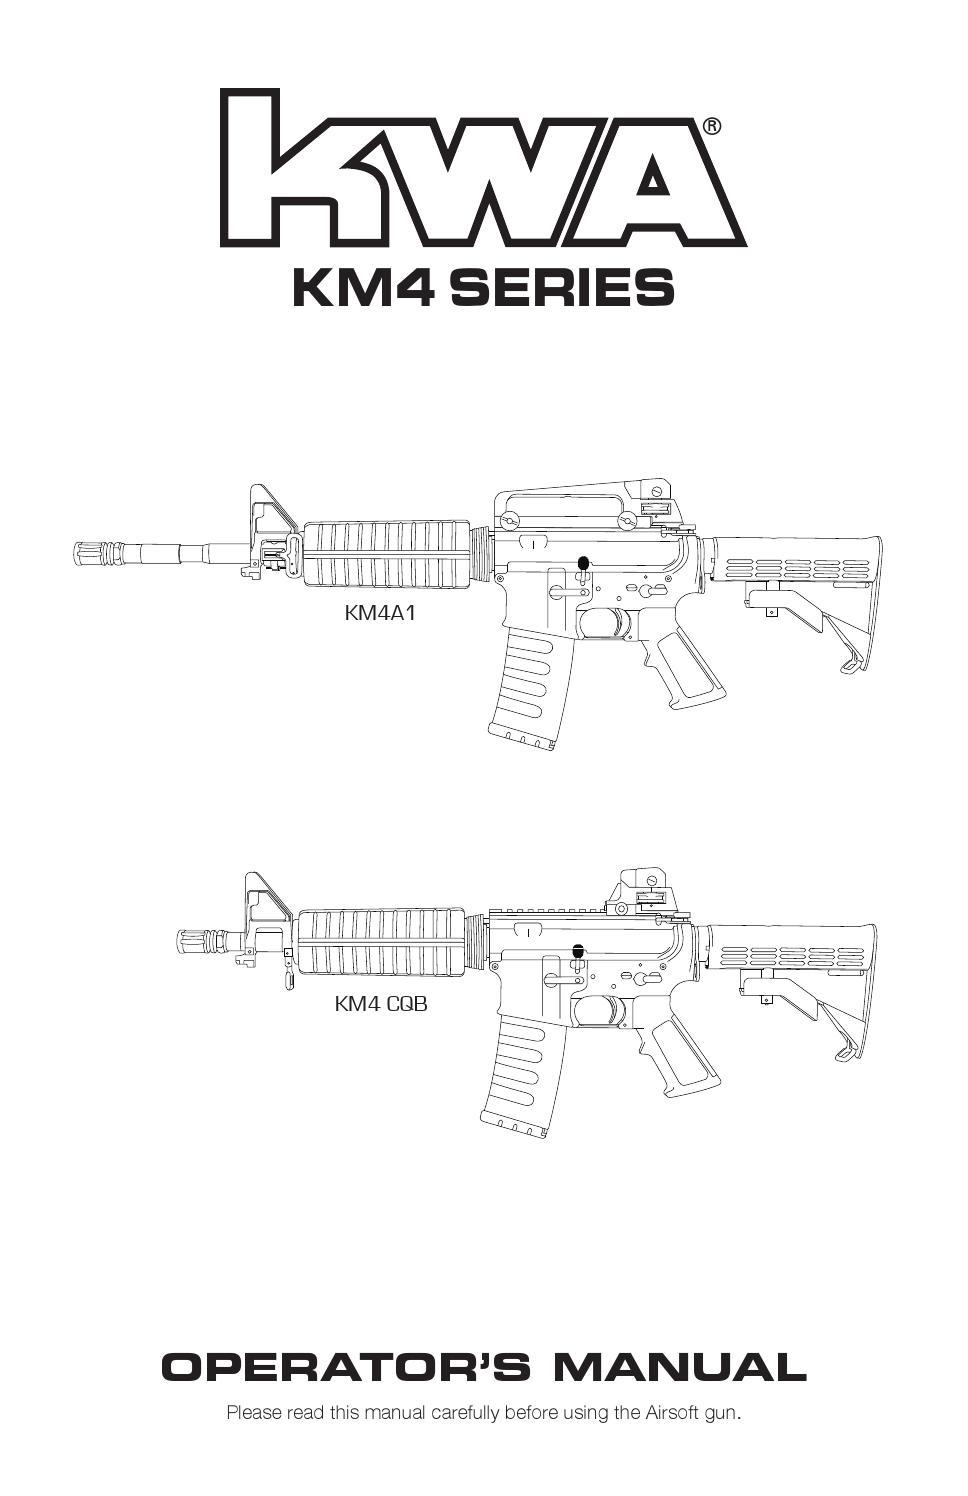 User manual km4 series by KWA USA - issuuIssuu